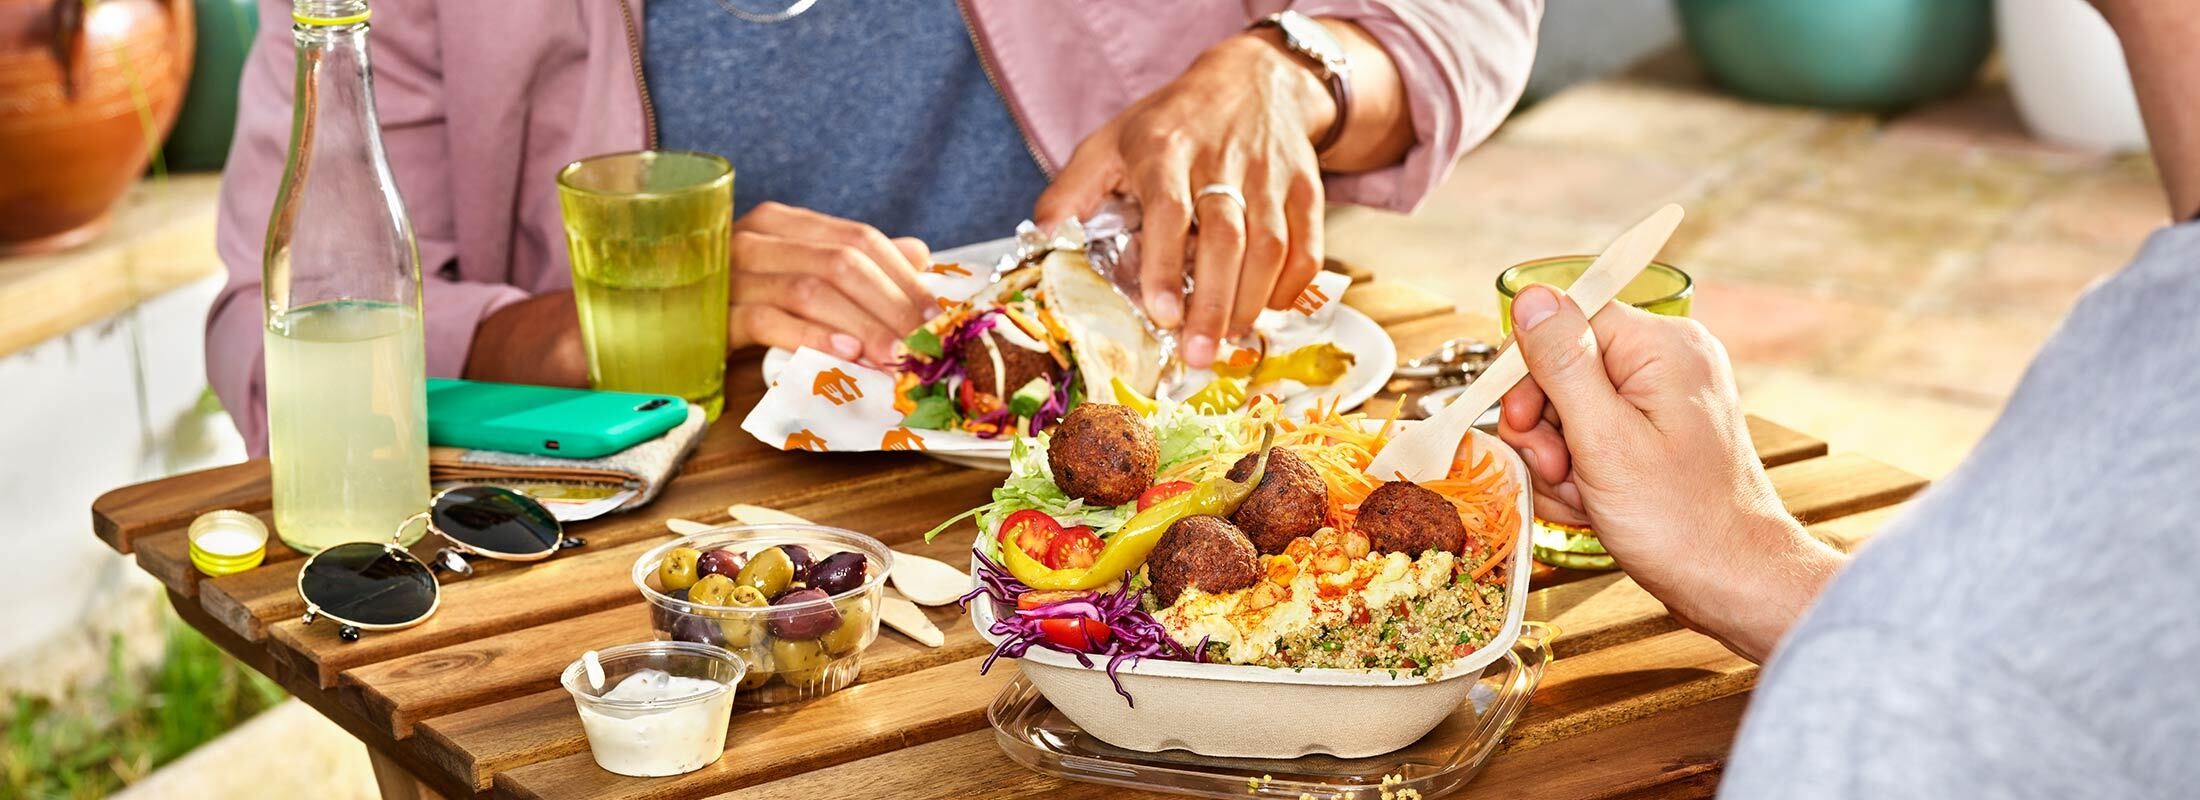 JET header Falafel Takeaway 2200